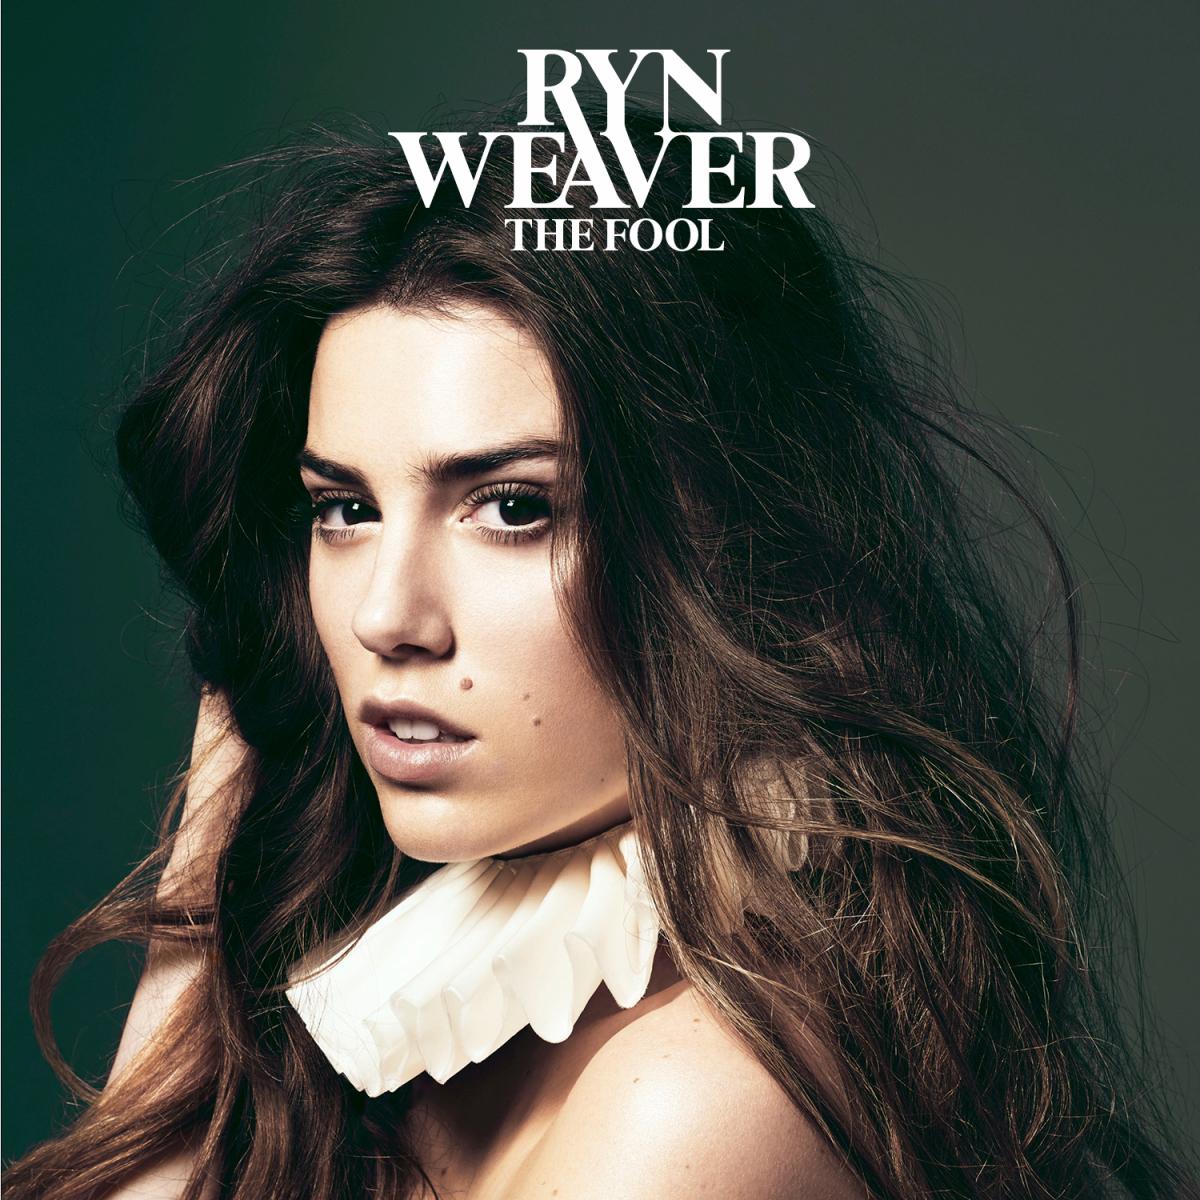 ryn-weaver-the-fool-album